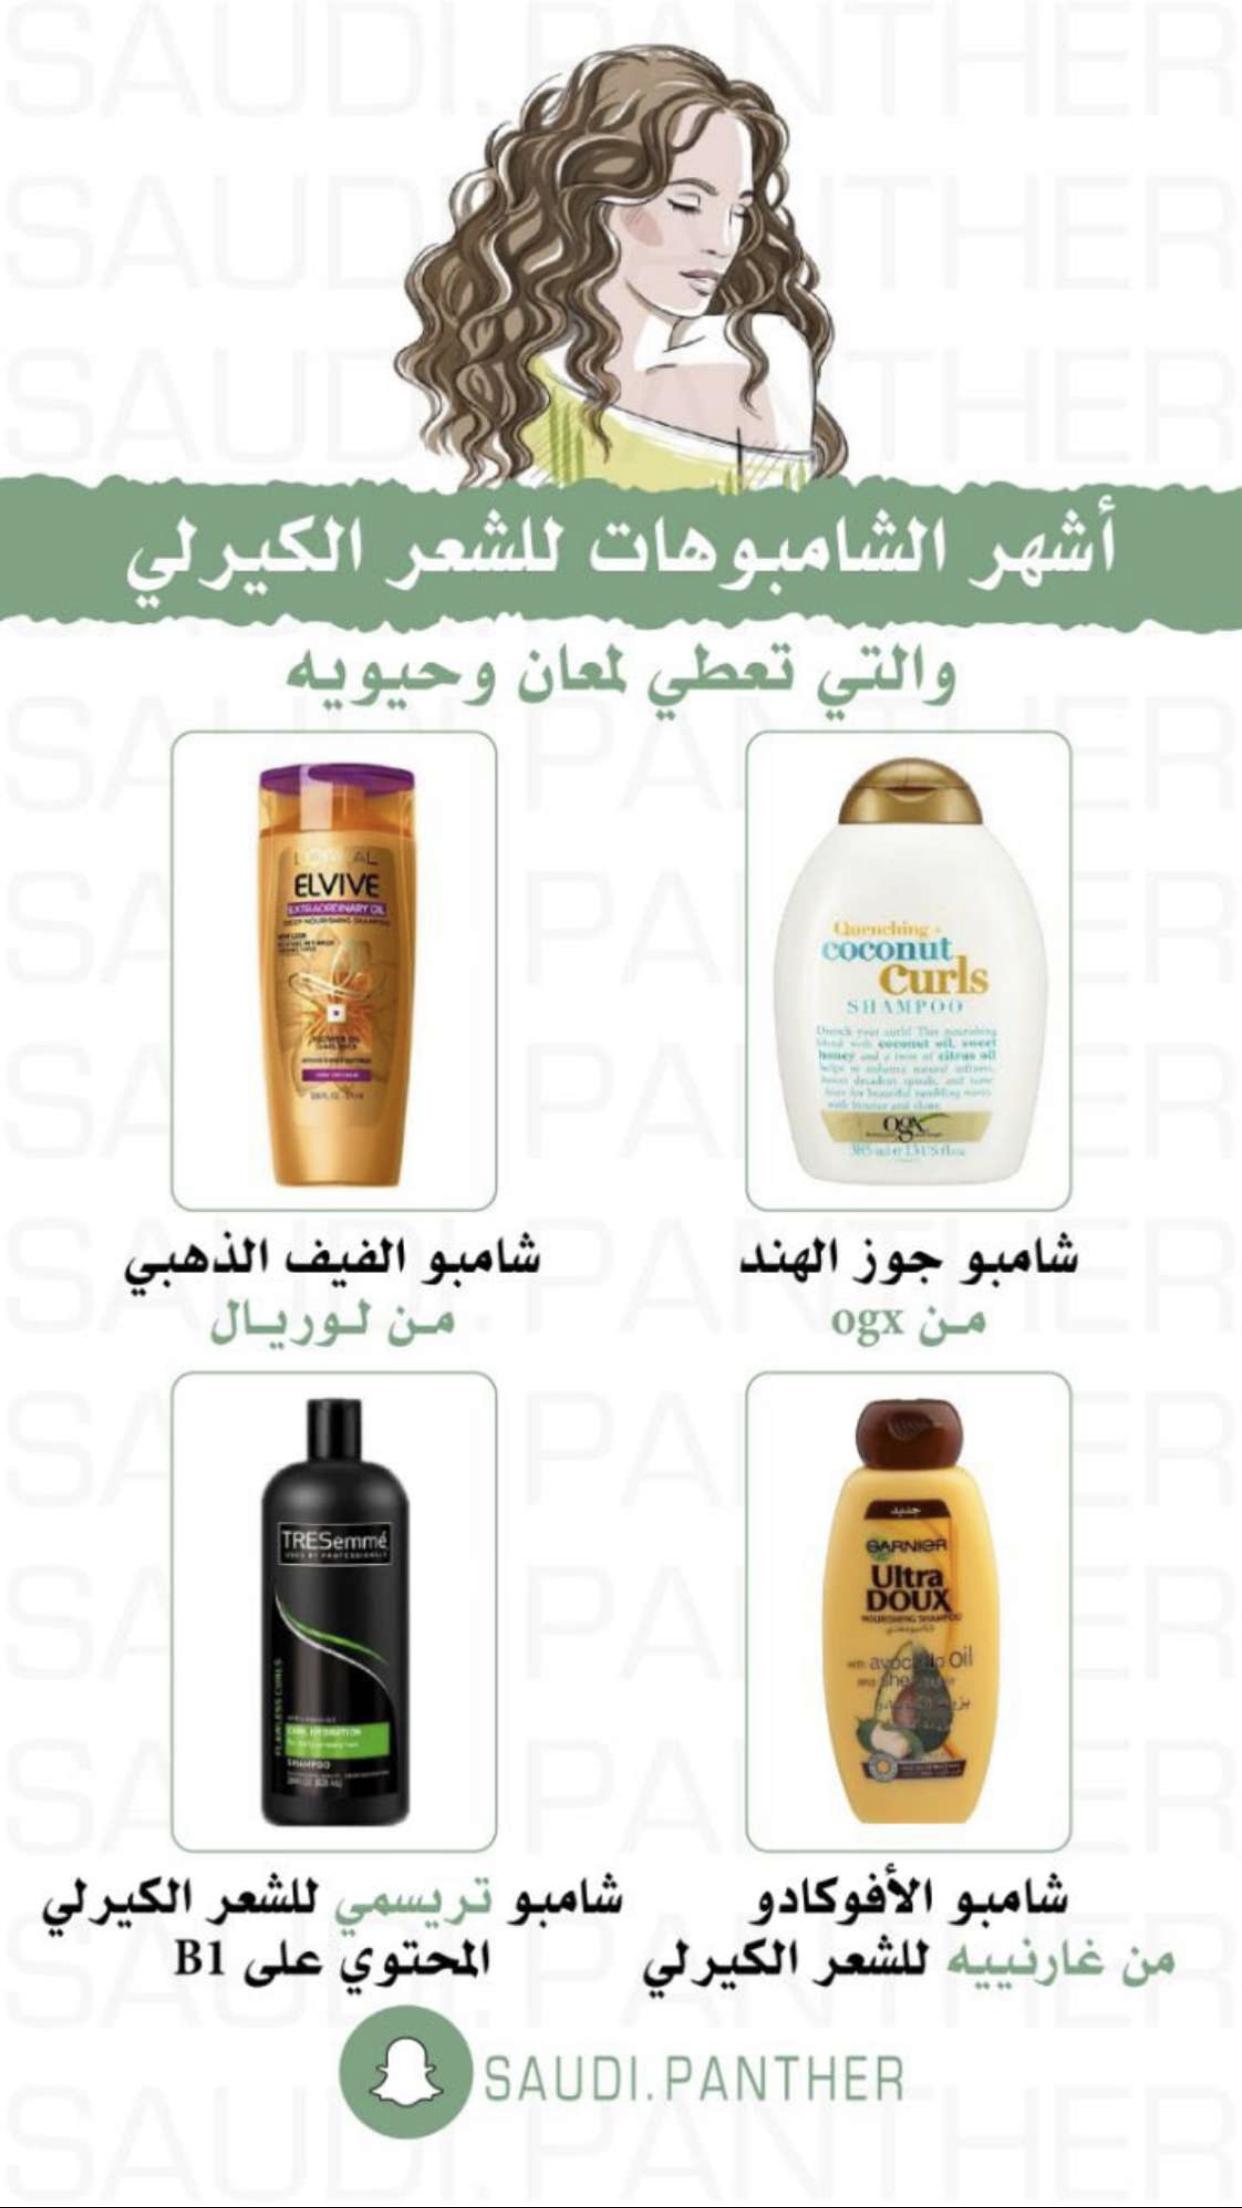 انواع شامبو مفيدة للشعر الكيرلي Hair Care Oils Pretty Skin Care Beauty Skin Care Routine